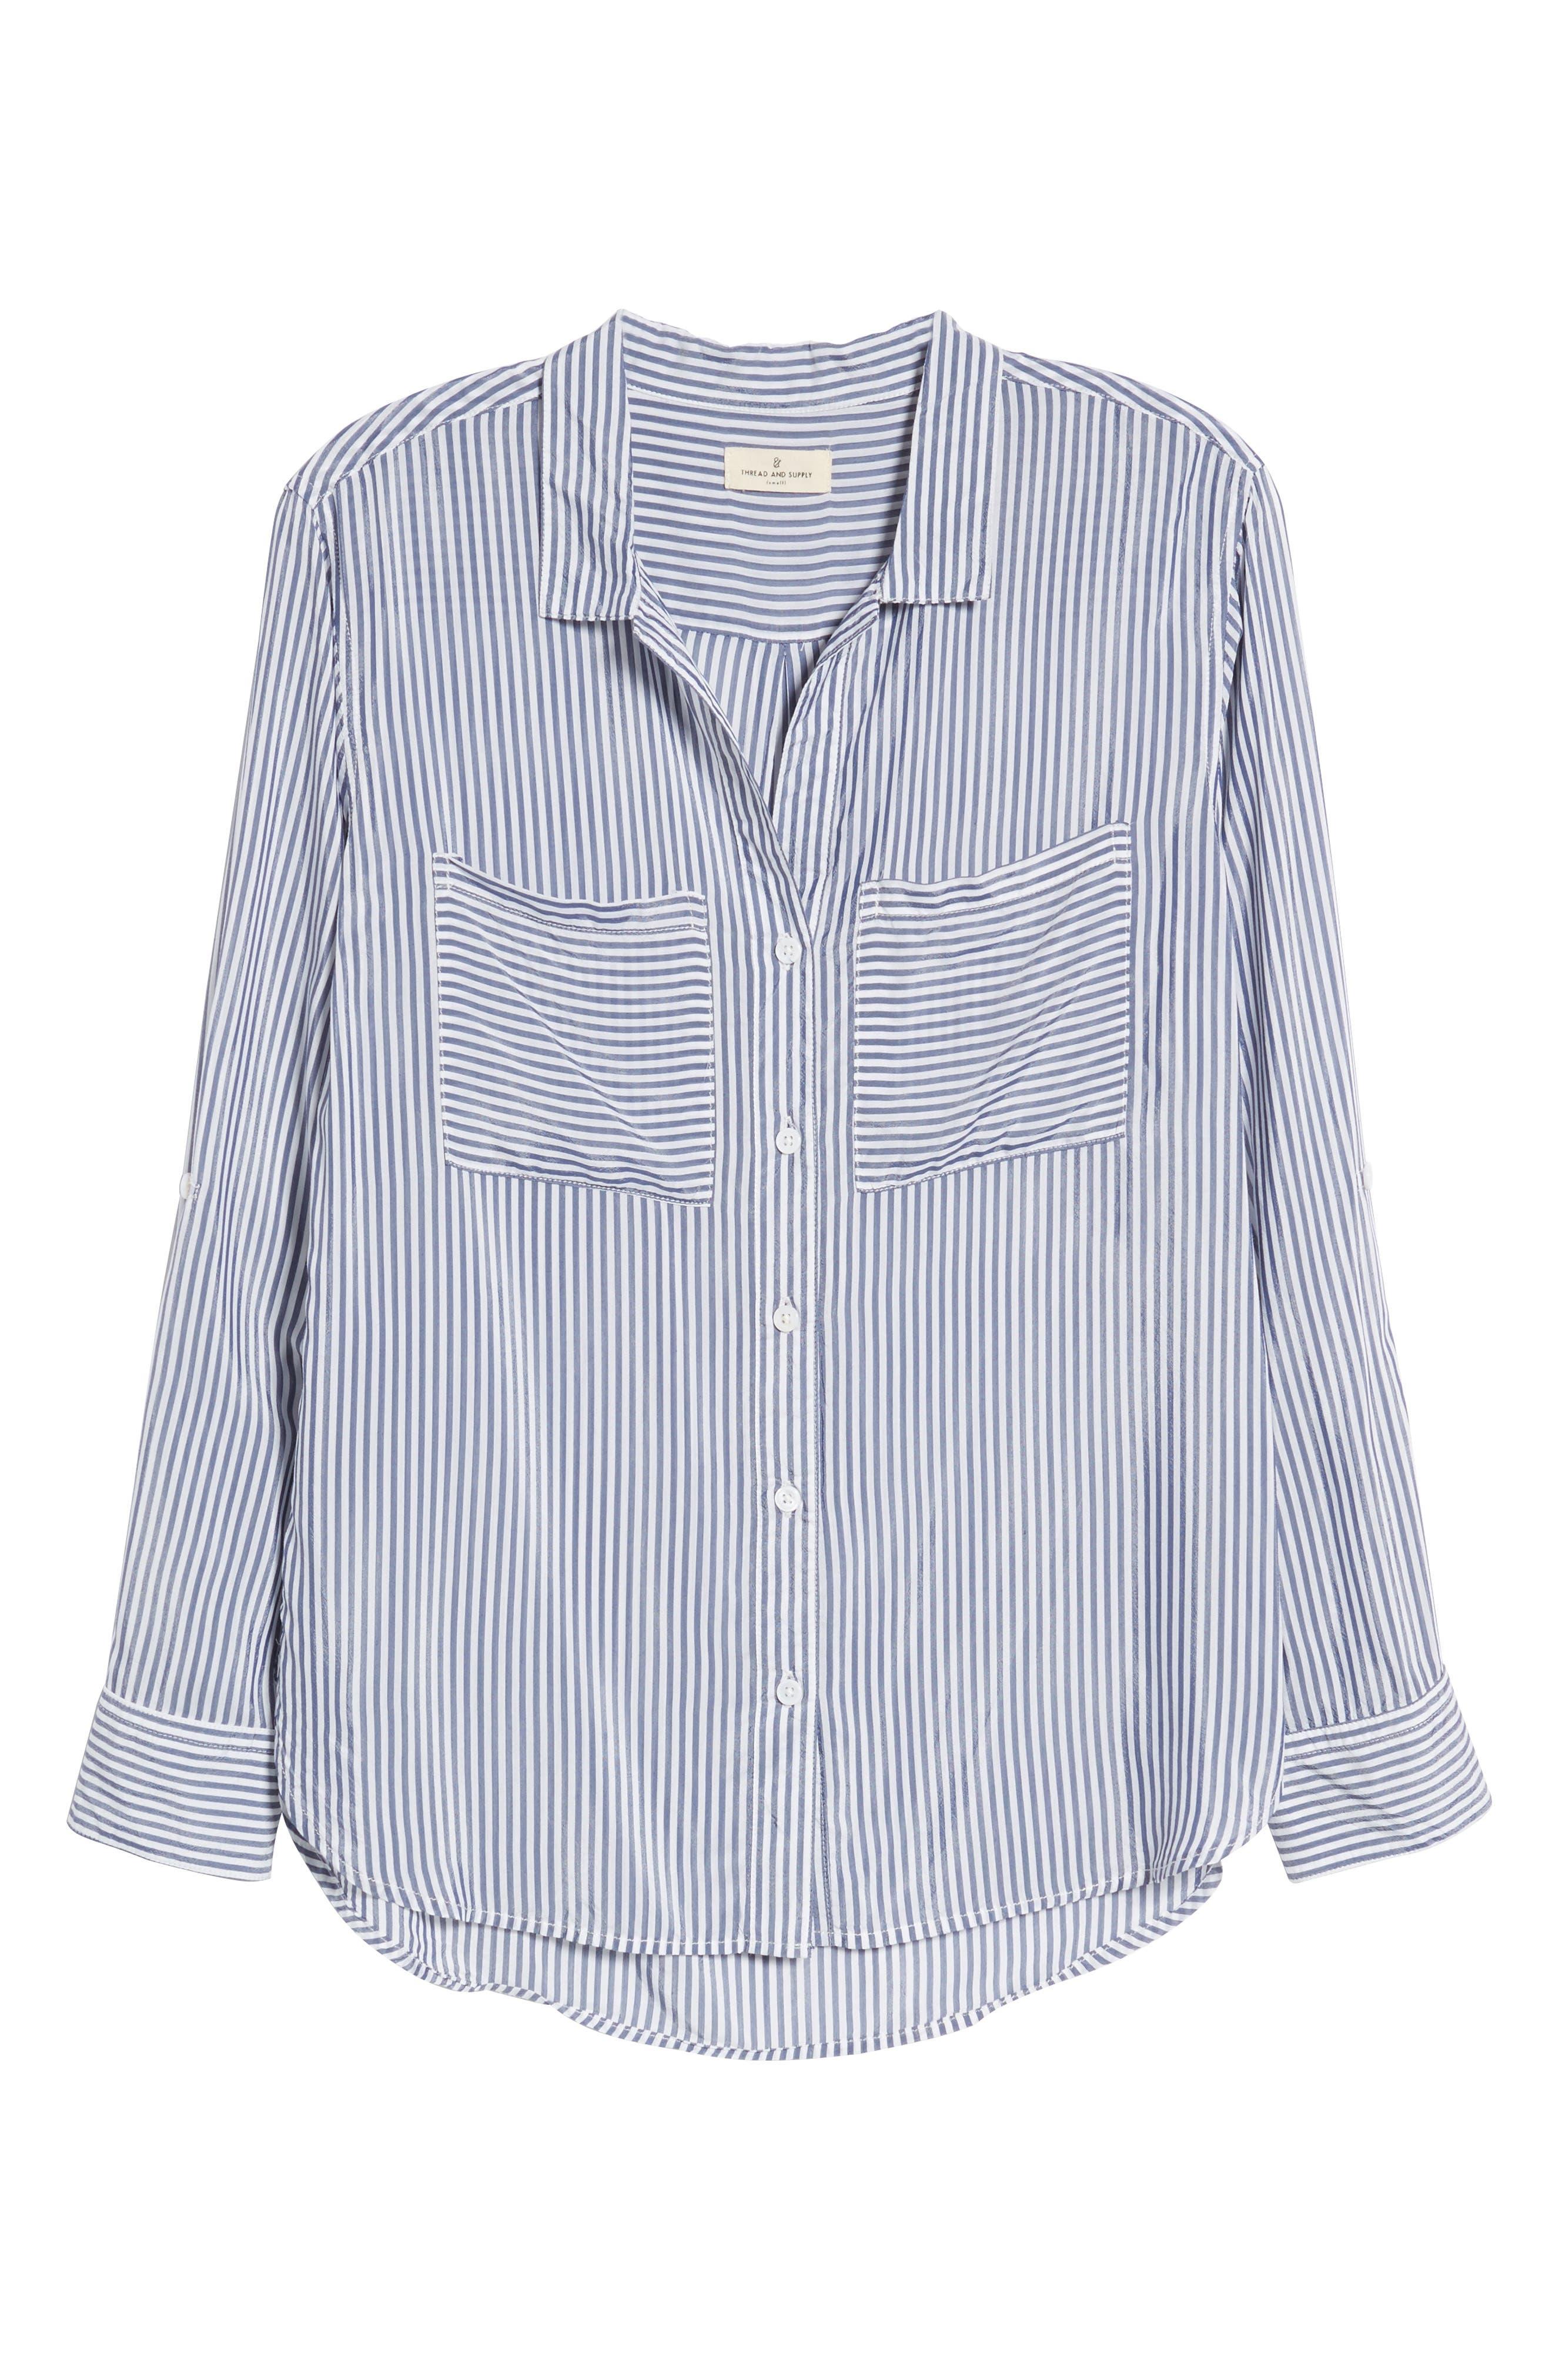 Zinc Stripe Shirt,                             Alternate thumbnail 6, color,                             Blue Stripe